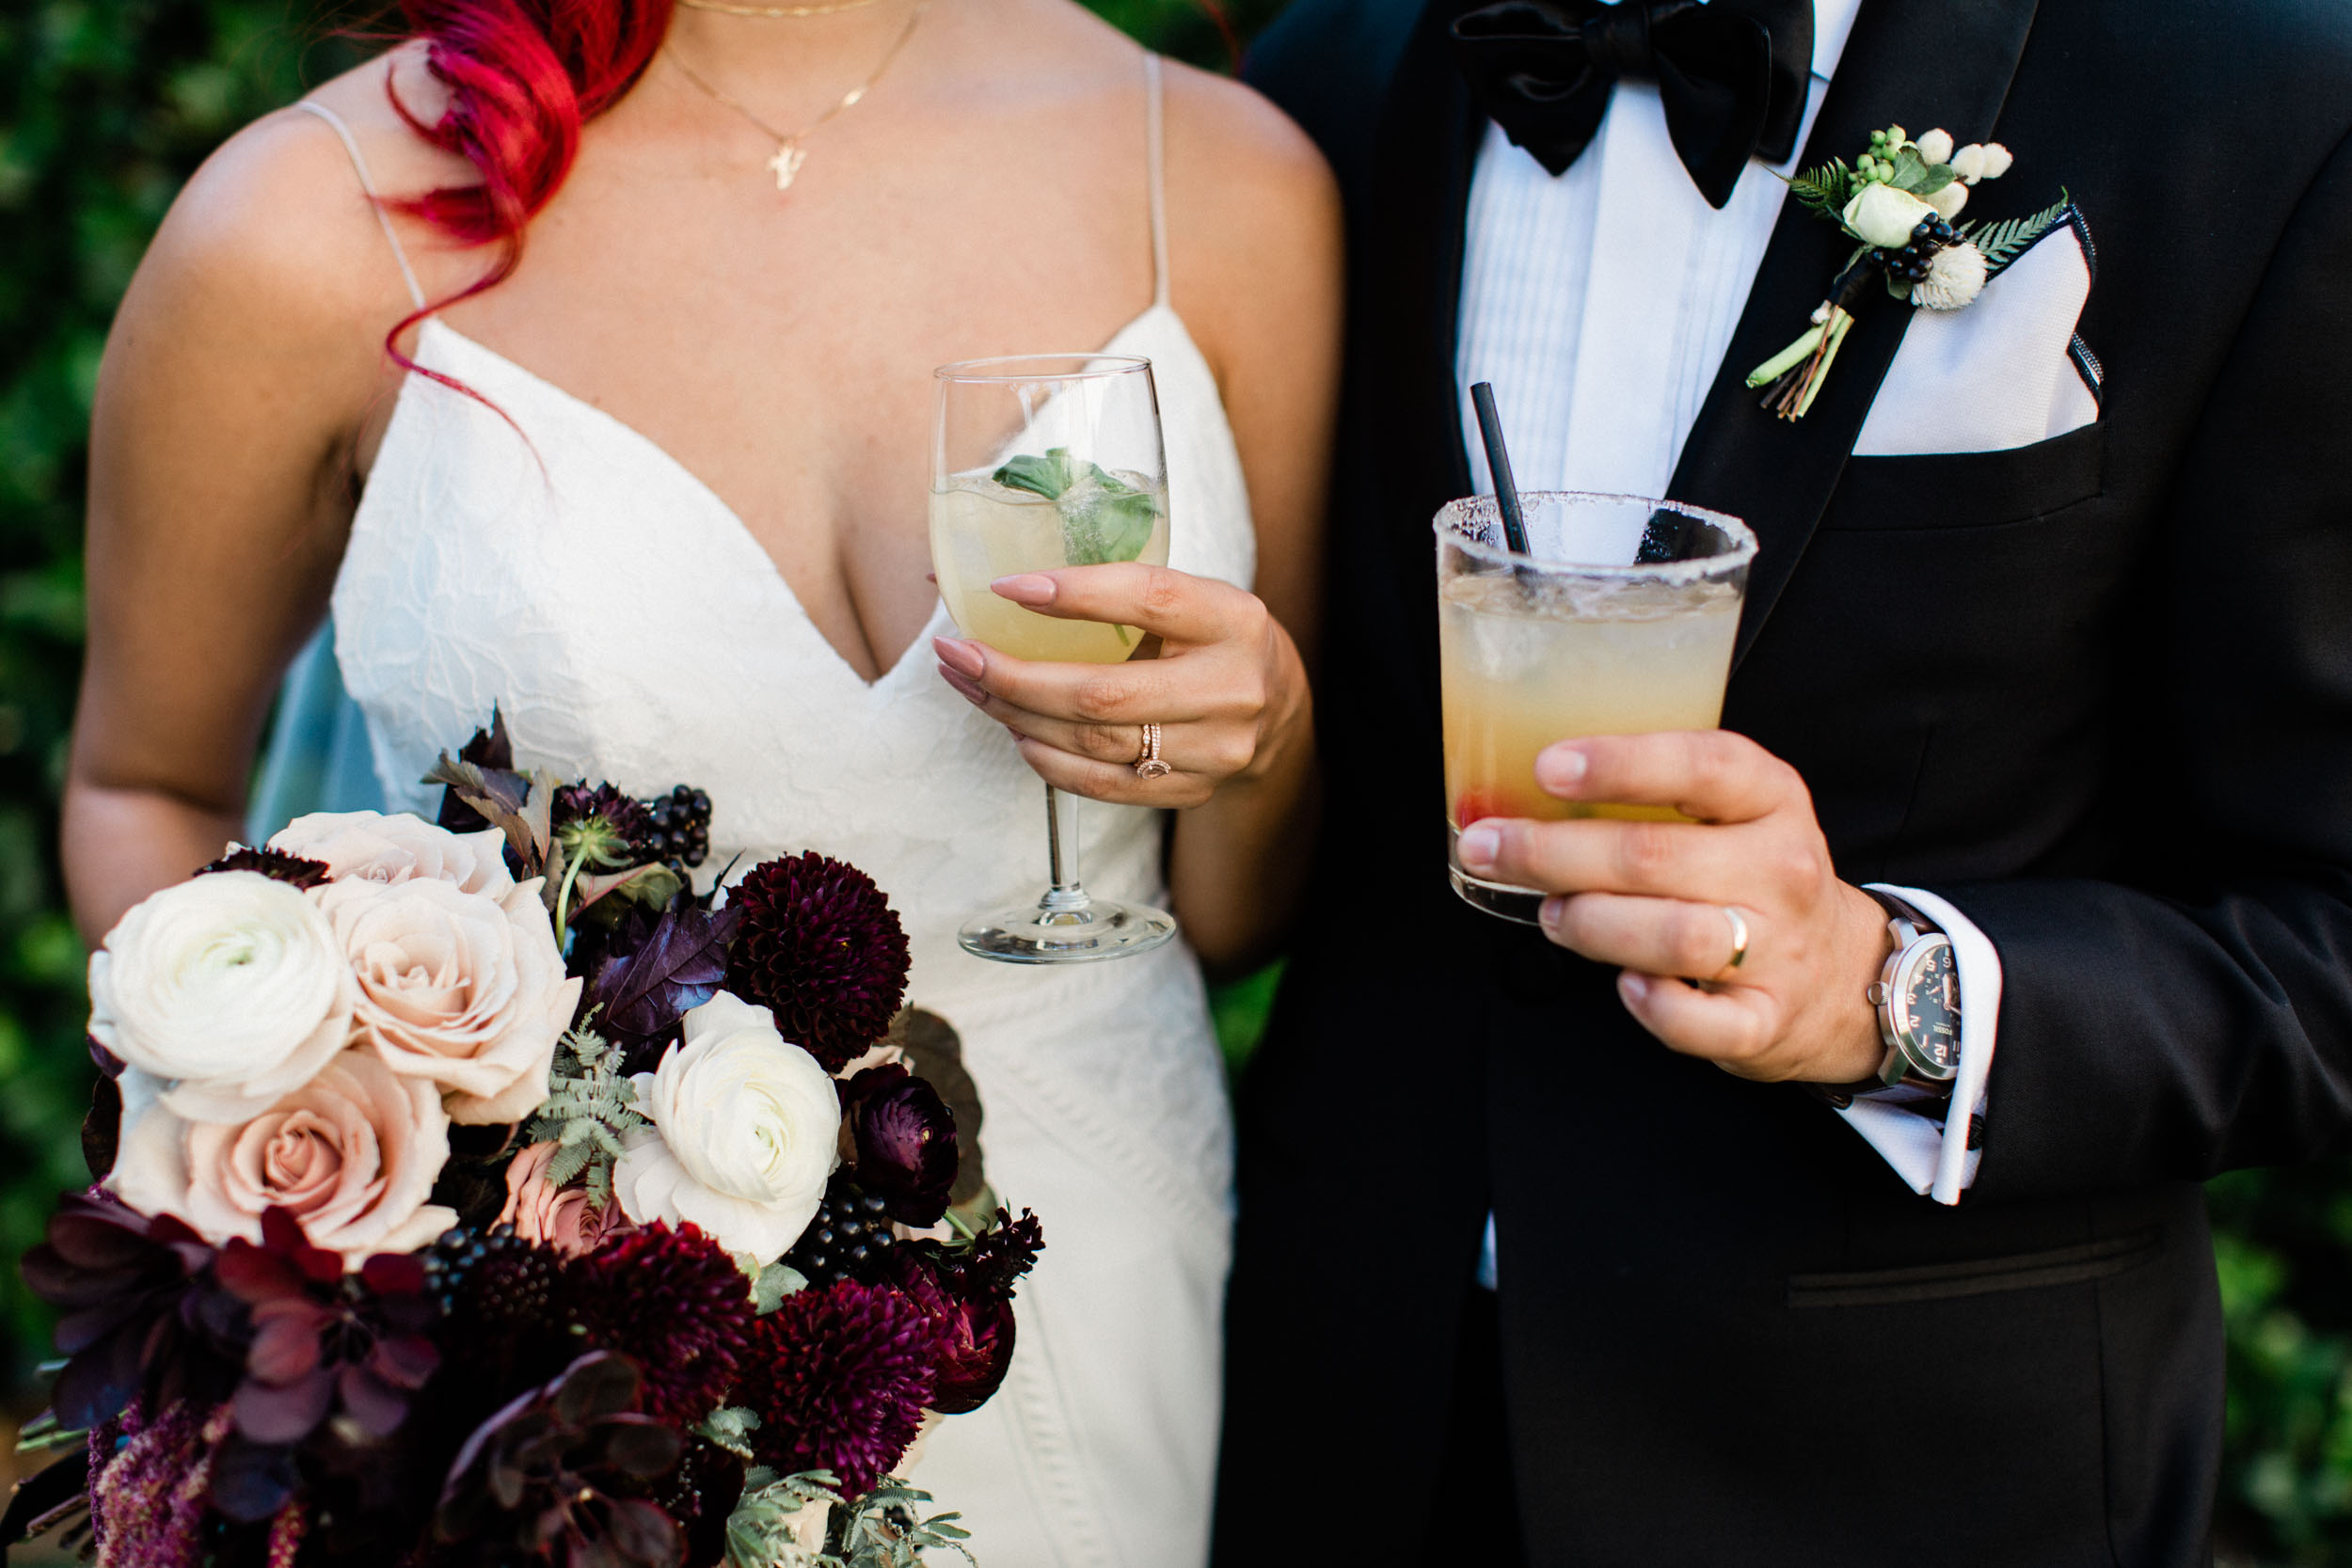 BKM-Photography-Los-Angeles-Highland-Park-York-Manor-Wedding-Photography-0829.jpg